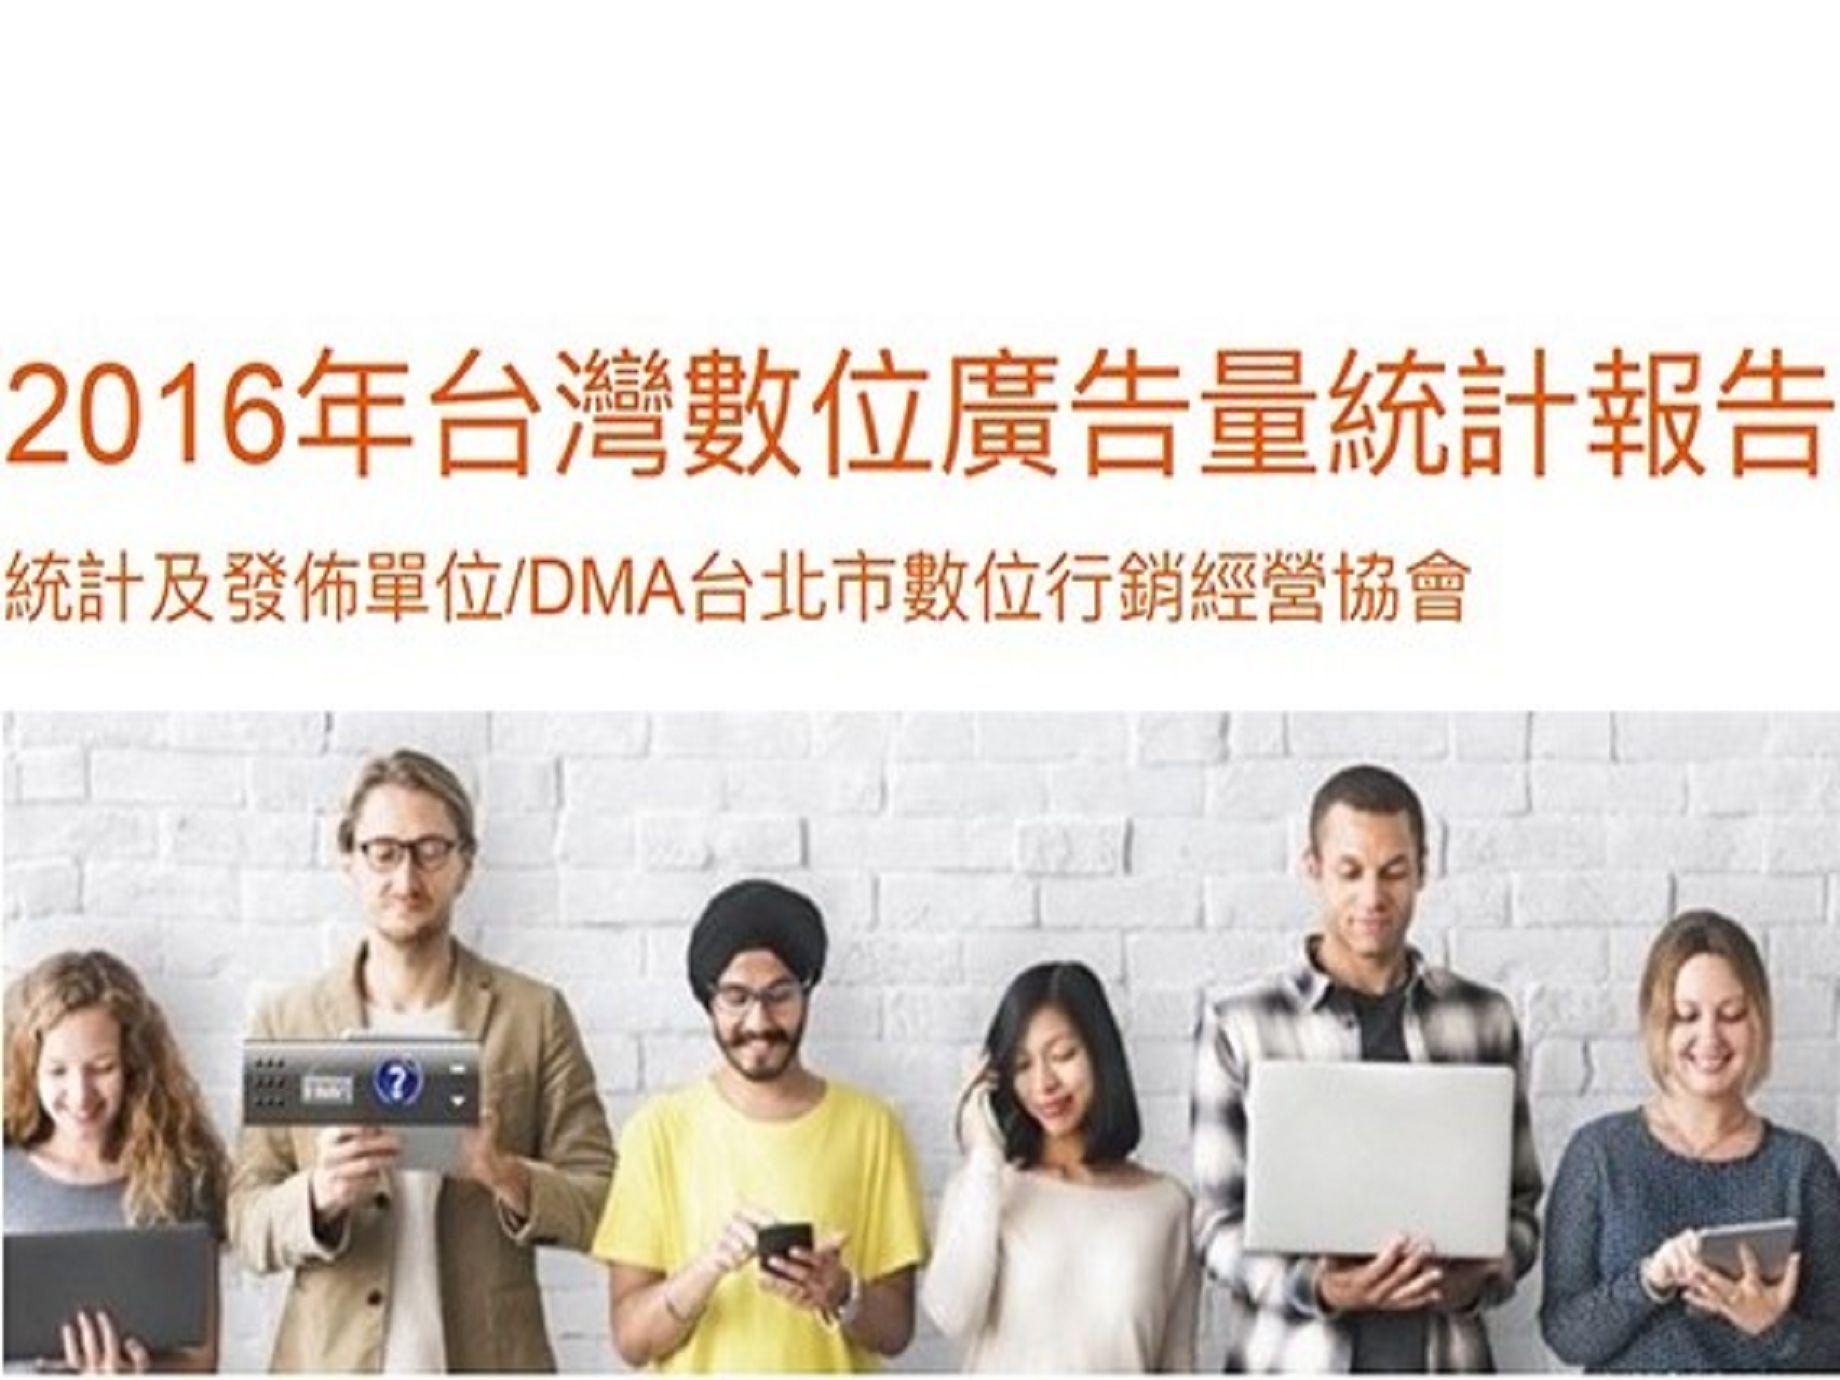 DMA發布2016全年數位廣告量調查報告